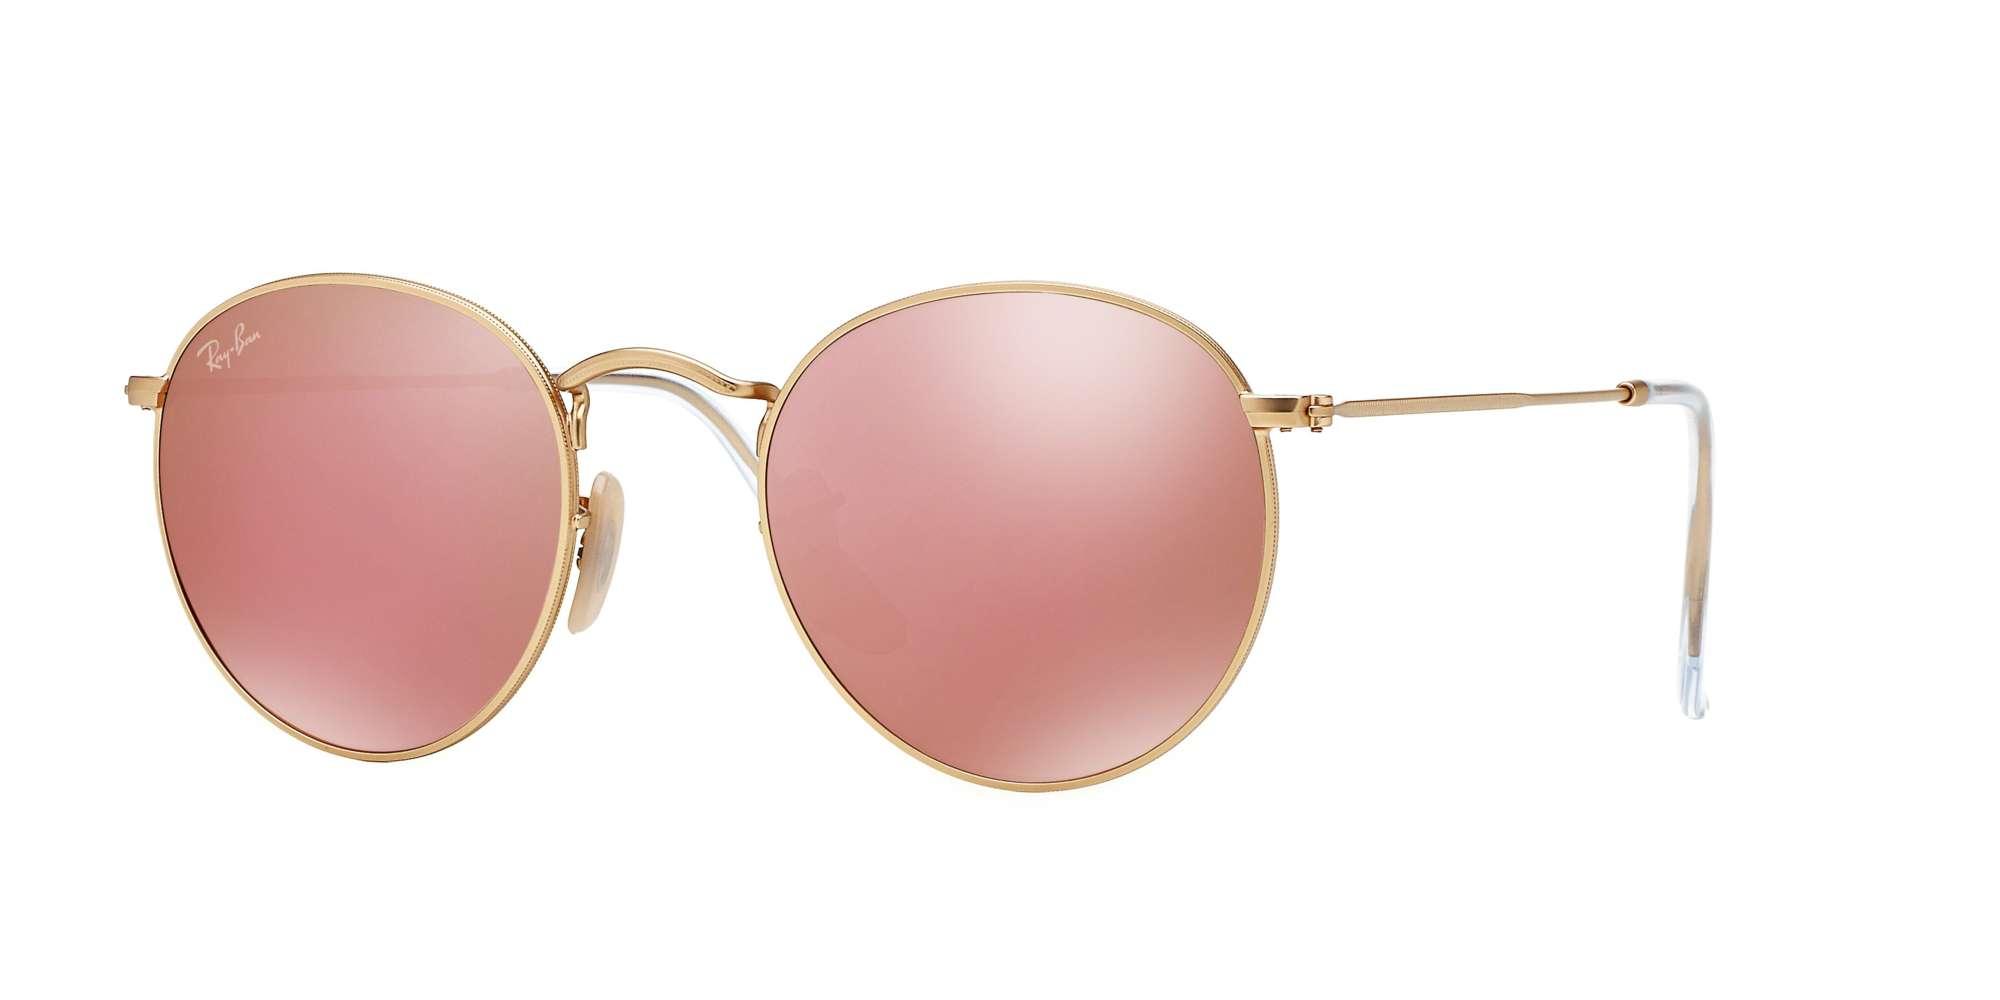 MATTE GOLD / BROWN MIRROR PINK lenses